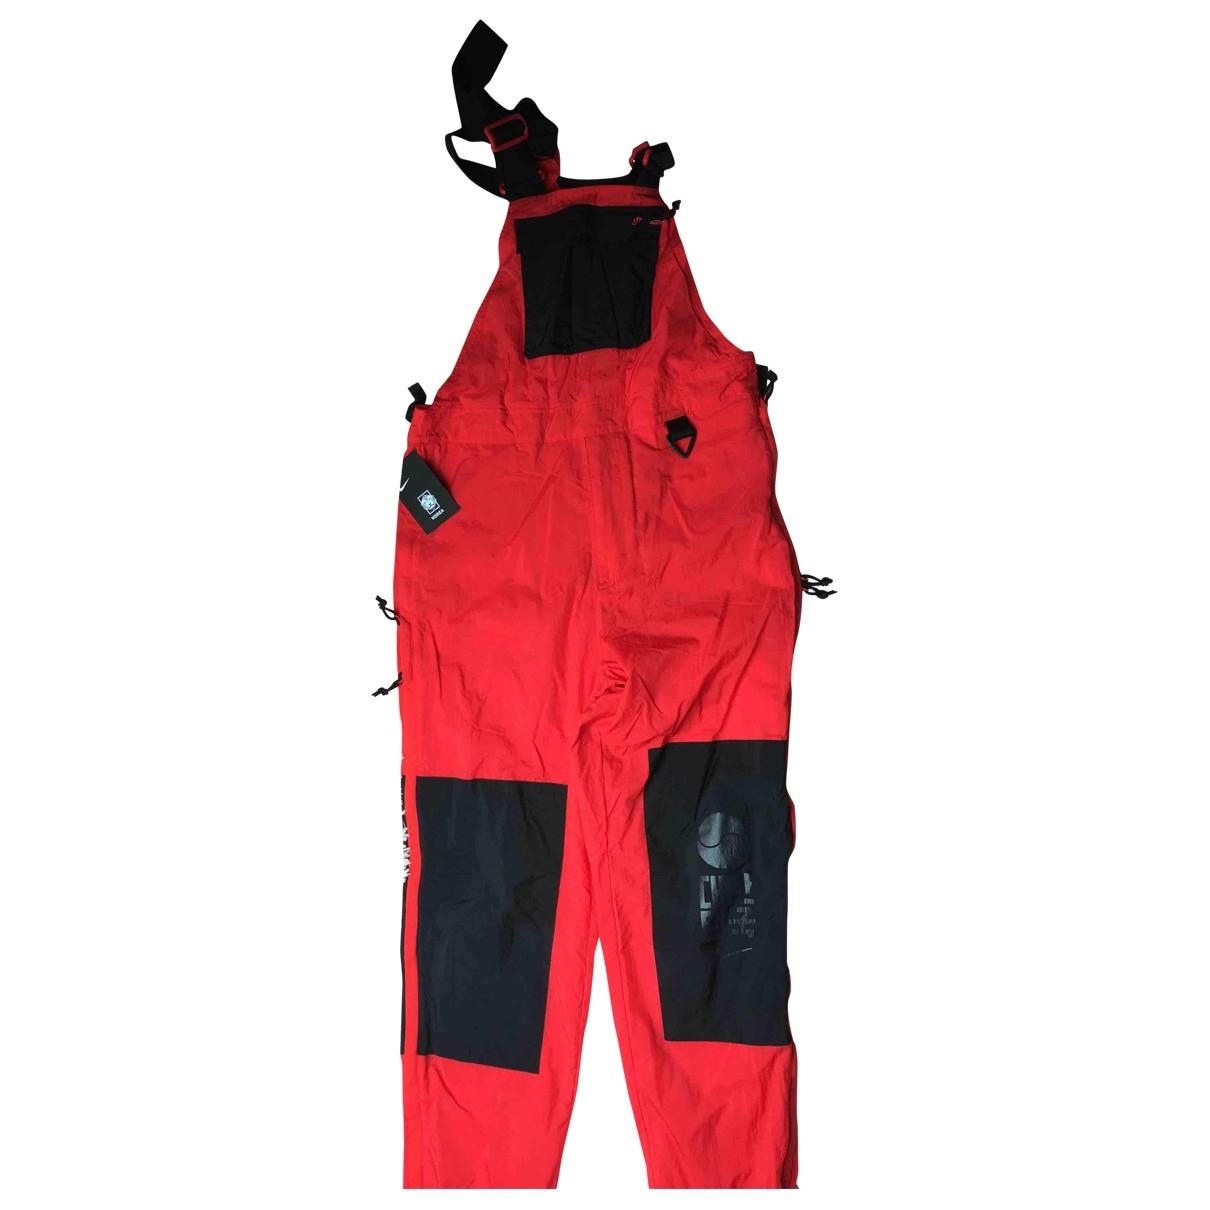 Nike \N Red Trousers for Men S International